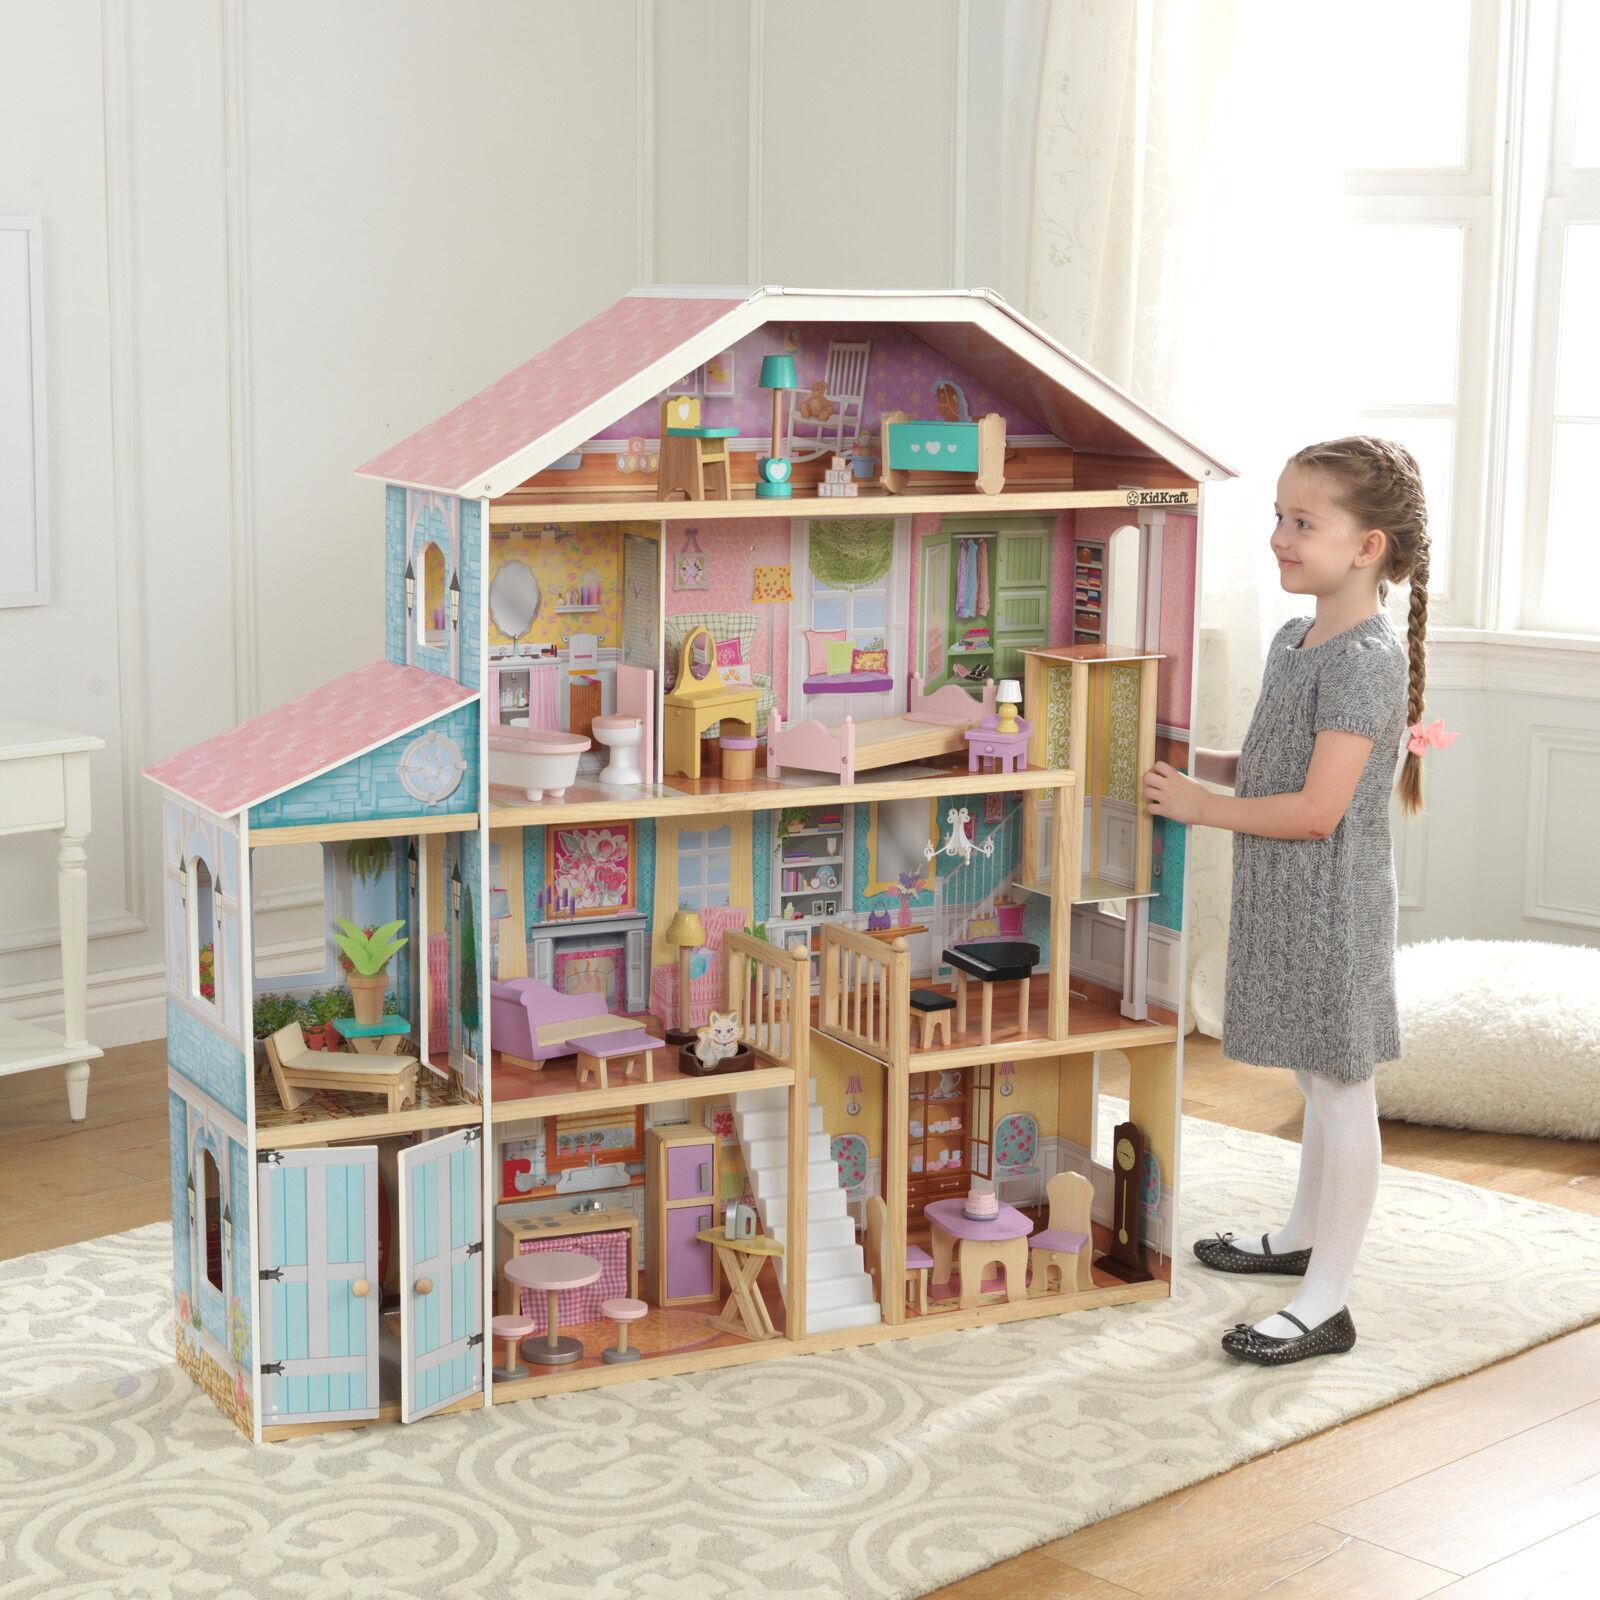 Kidkraft Mansion Doll House Grand View Wooden Kids Girls Toy Pretend Play Fun